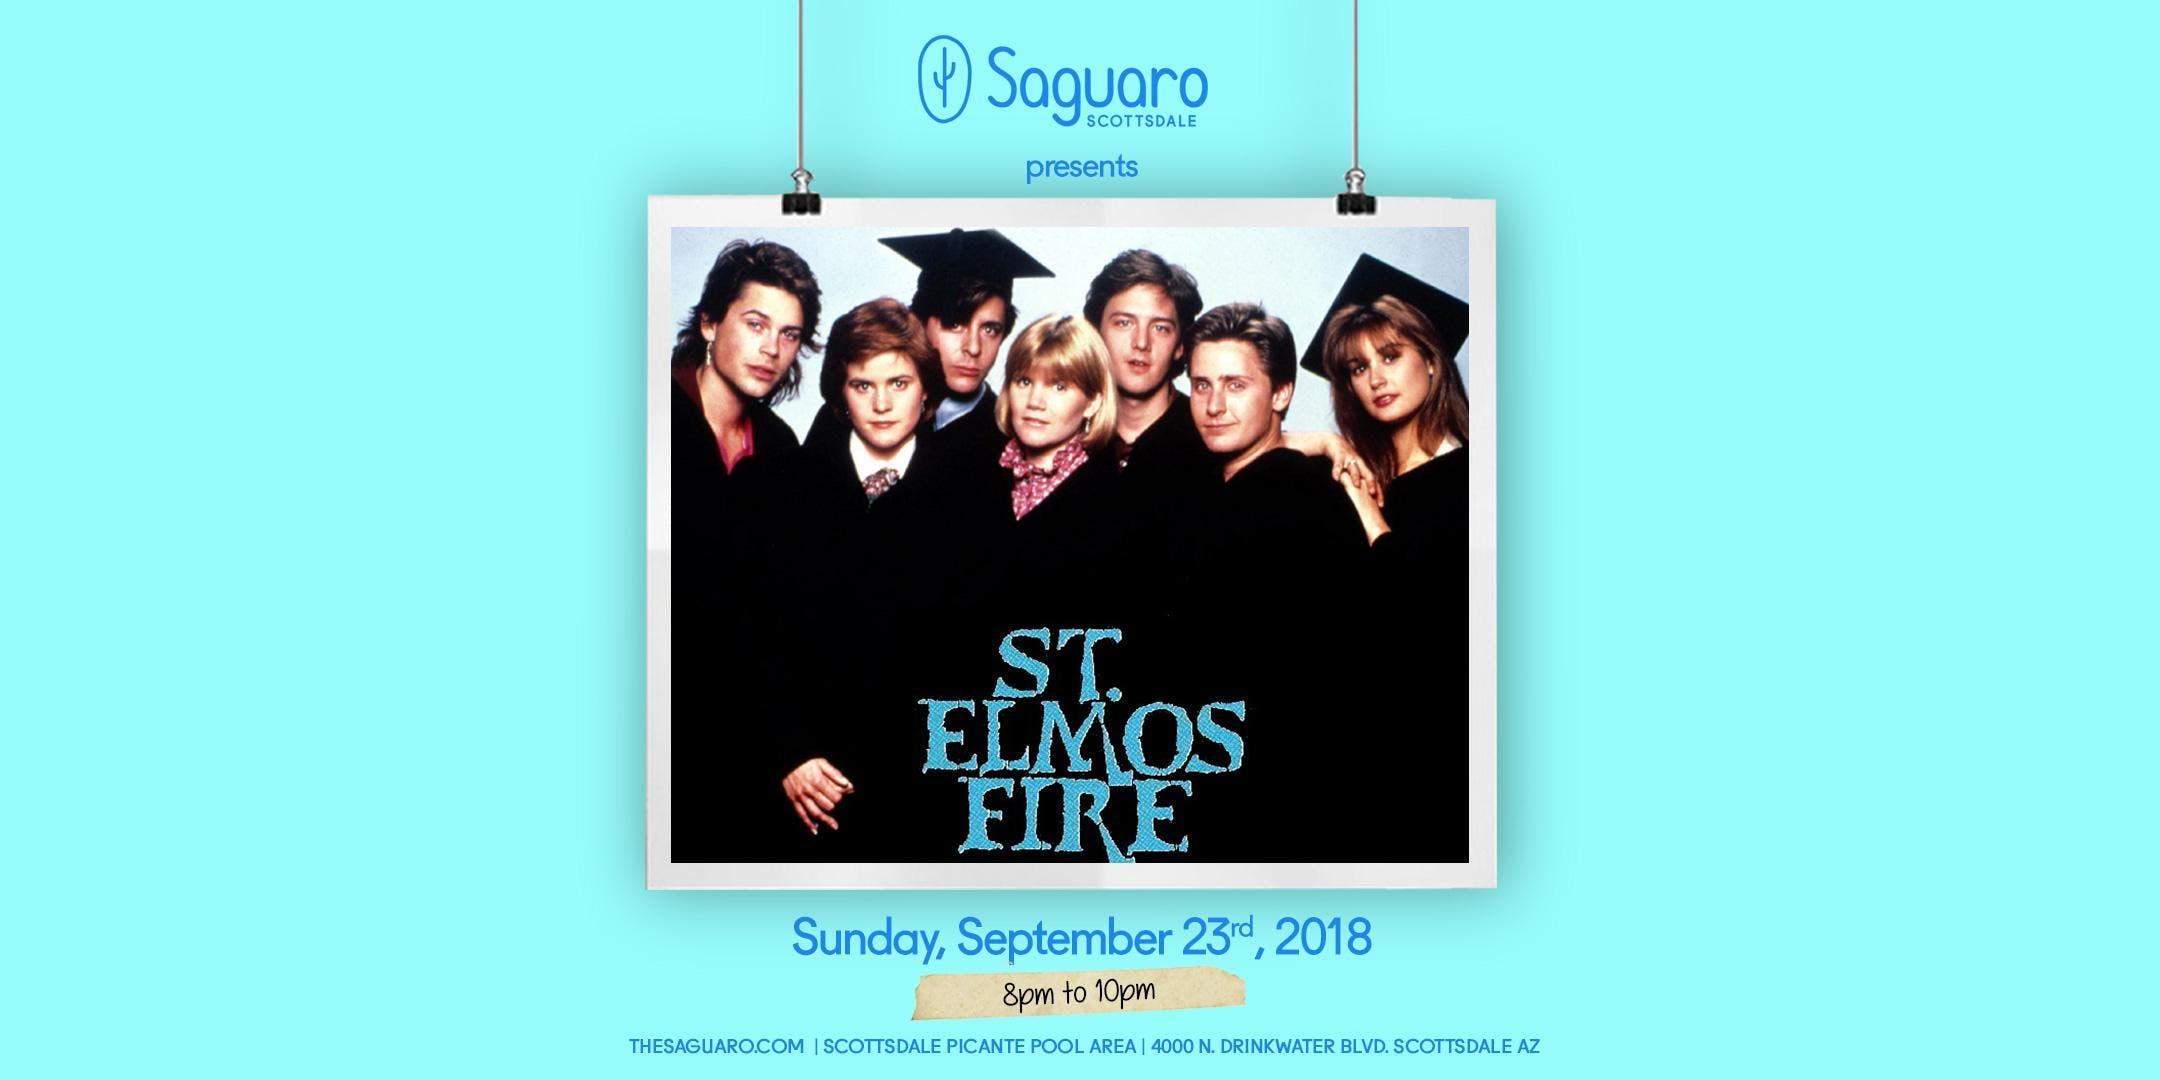 The Saguaro Scottsdale screening of 'St. Elmo's Fire'